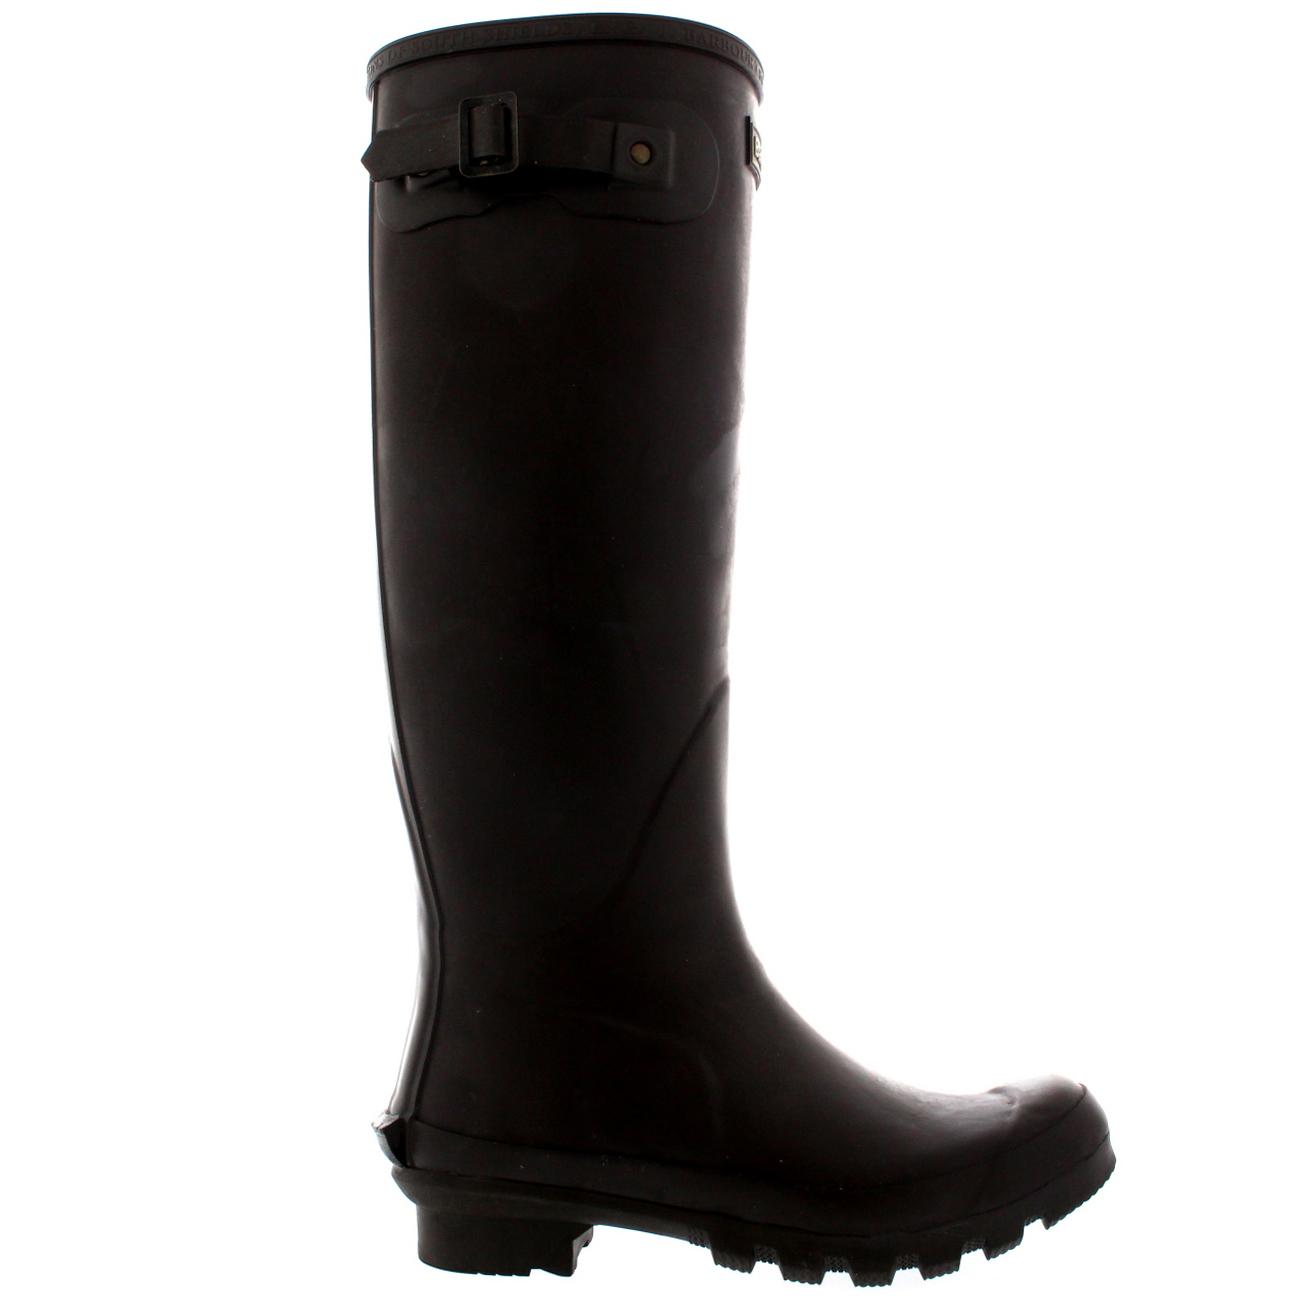 Womens-Barbour-Bede-Snow-Waterproof-Winter-Wellingtons-Mid-Calf-Boots-US-5-11 thumbnail 17